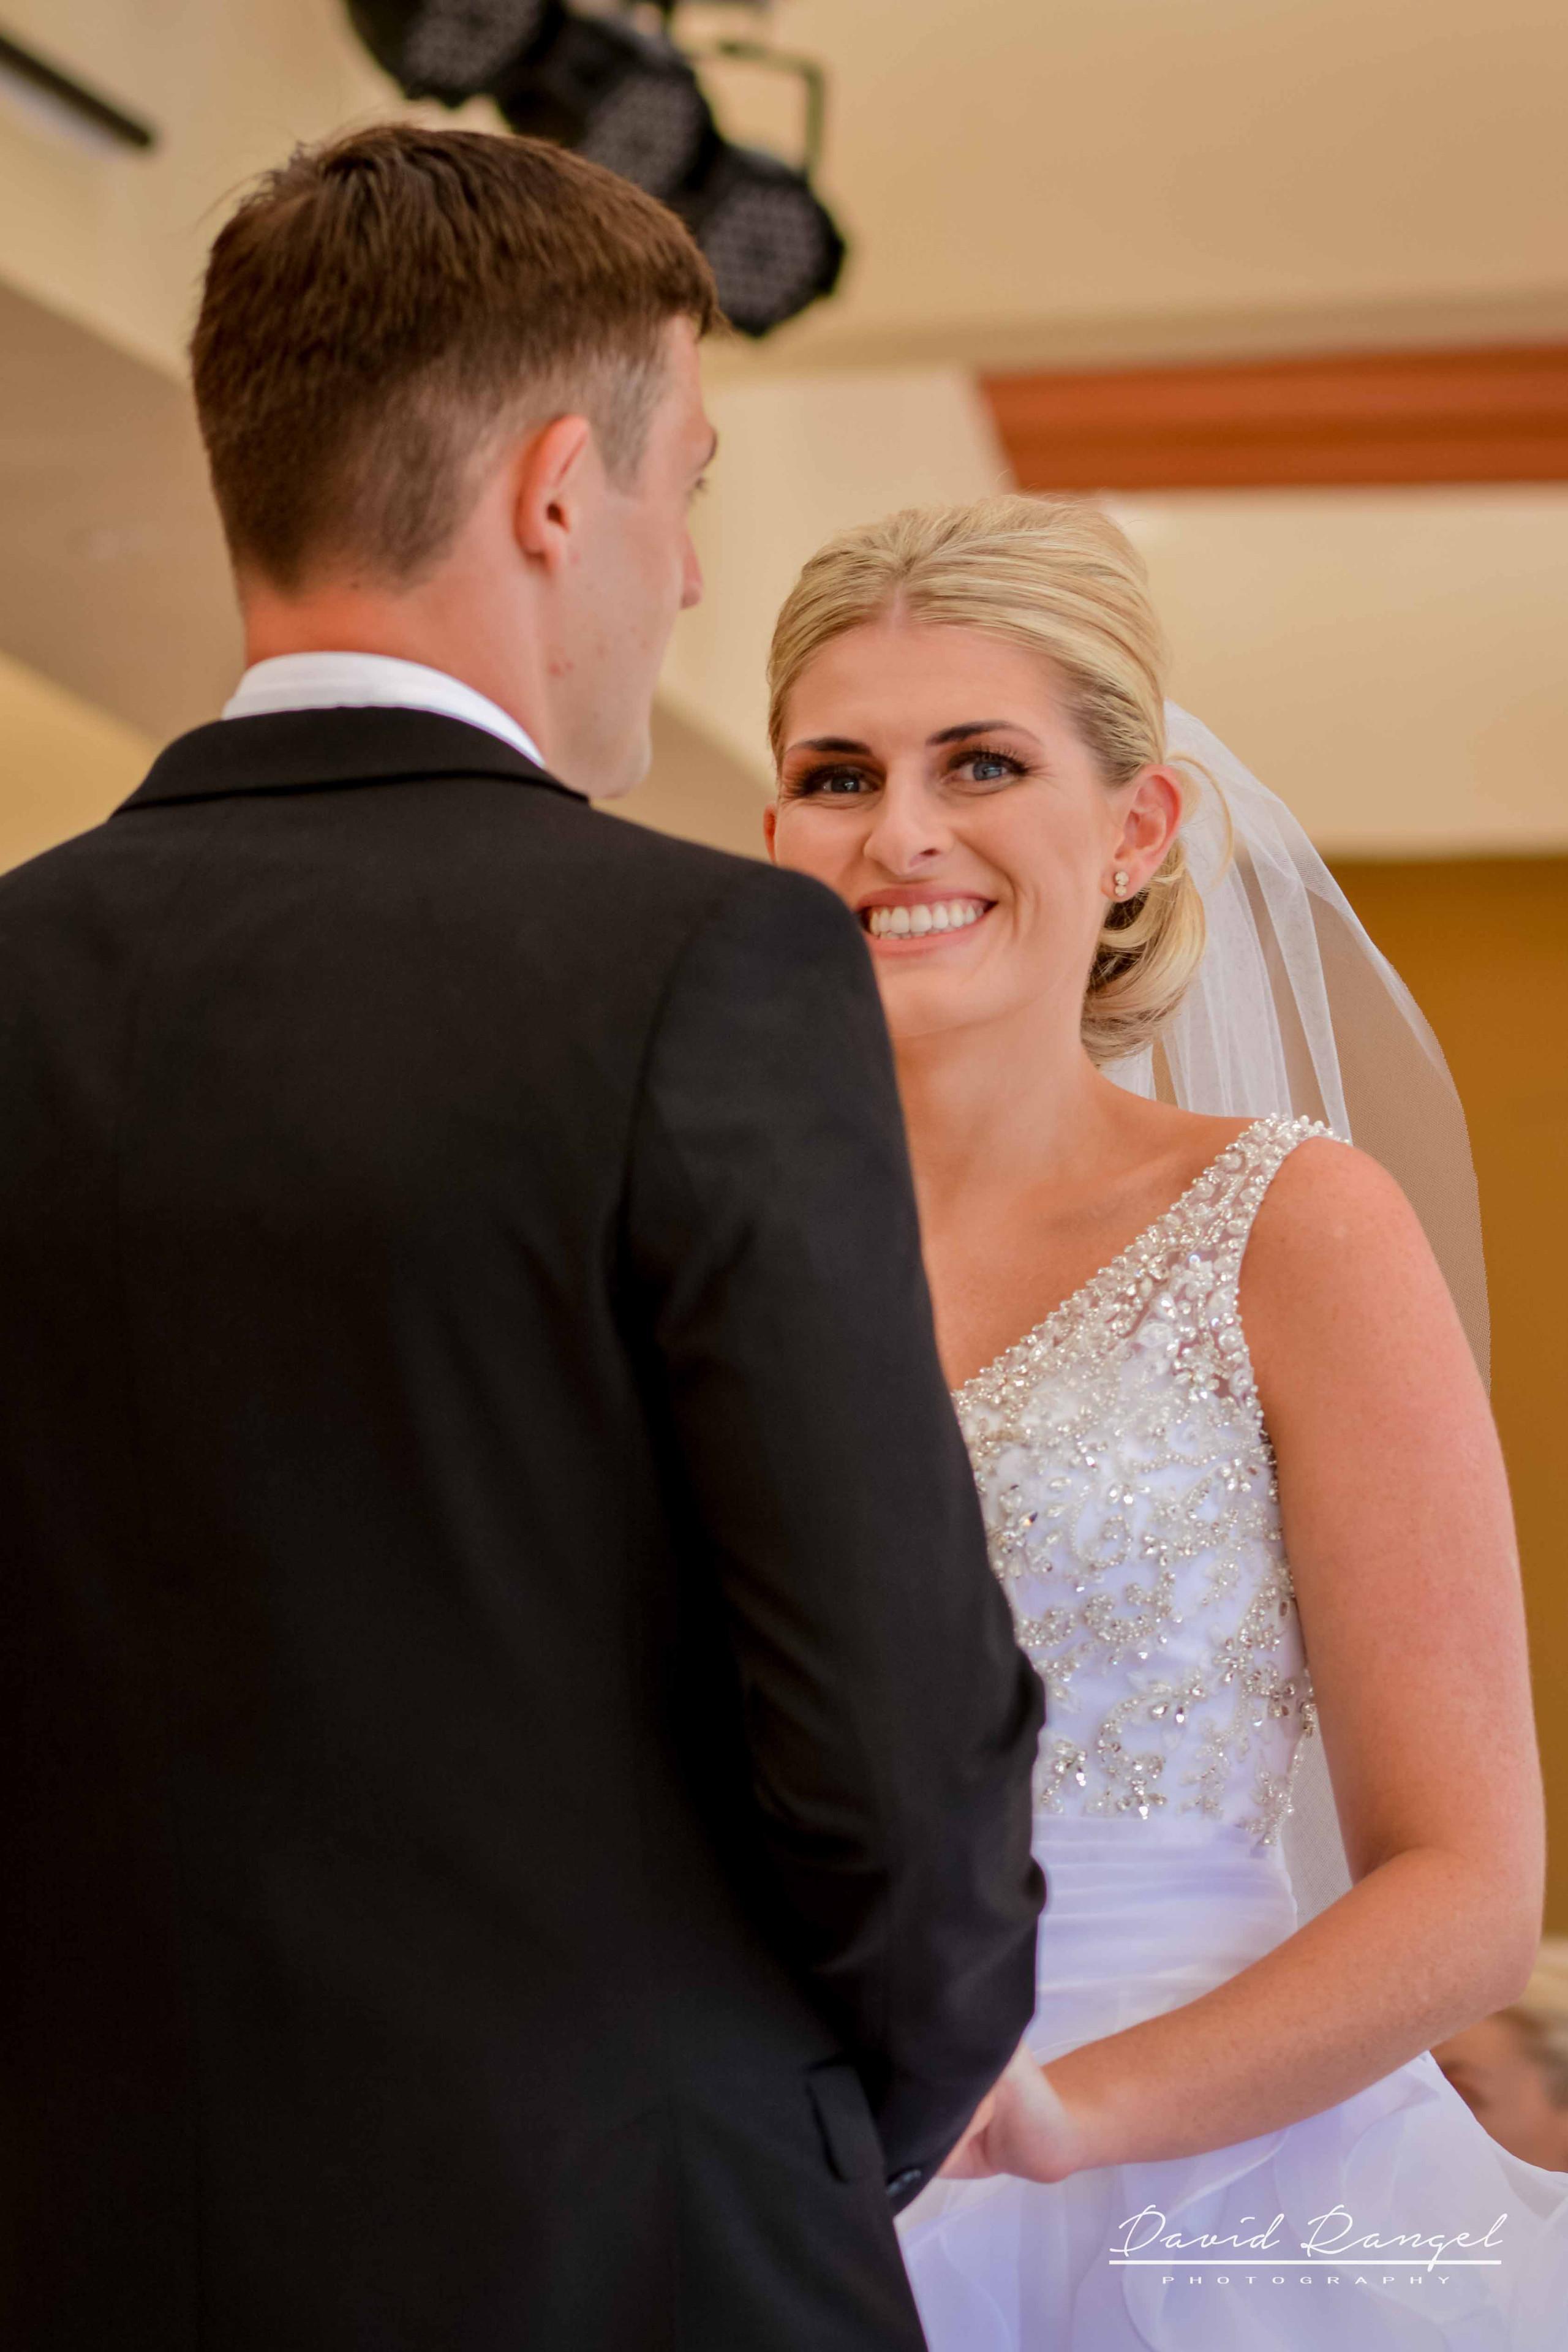 wedding+photographer+in+cancun